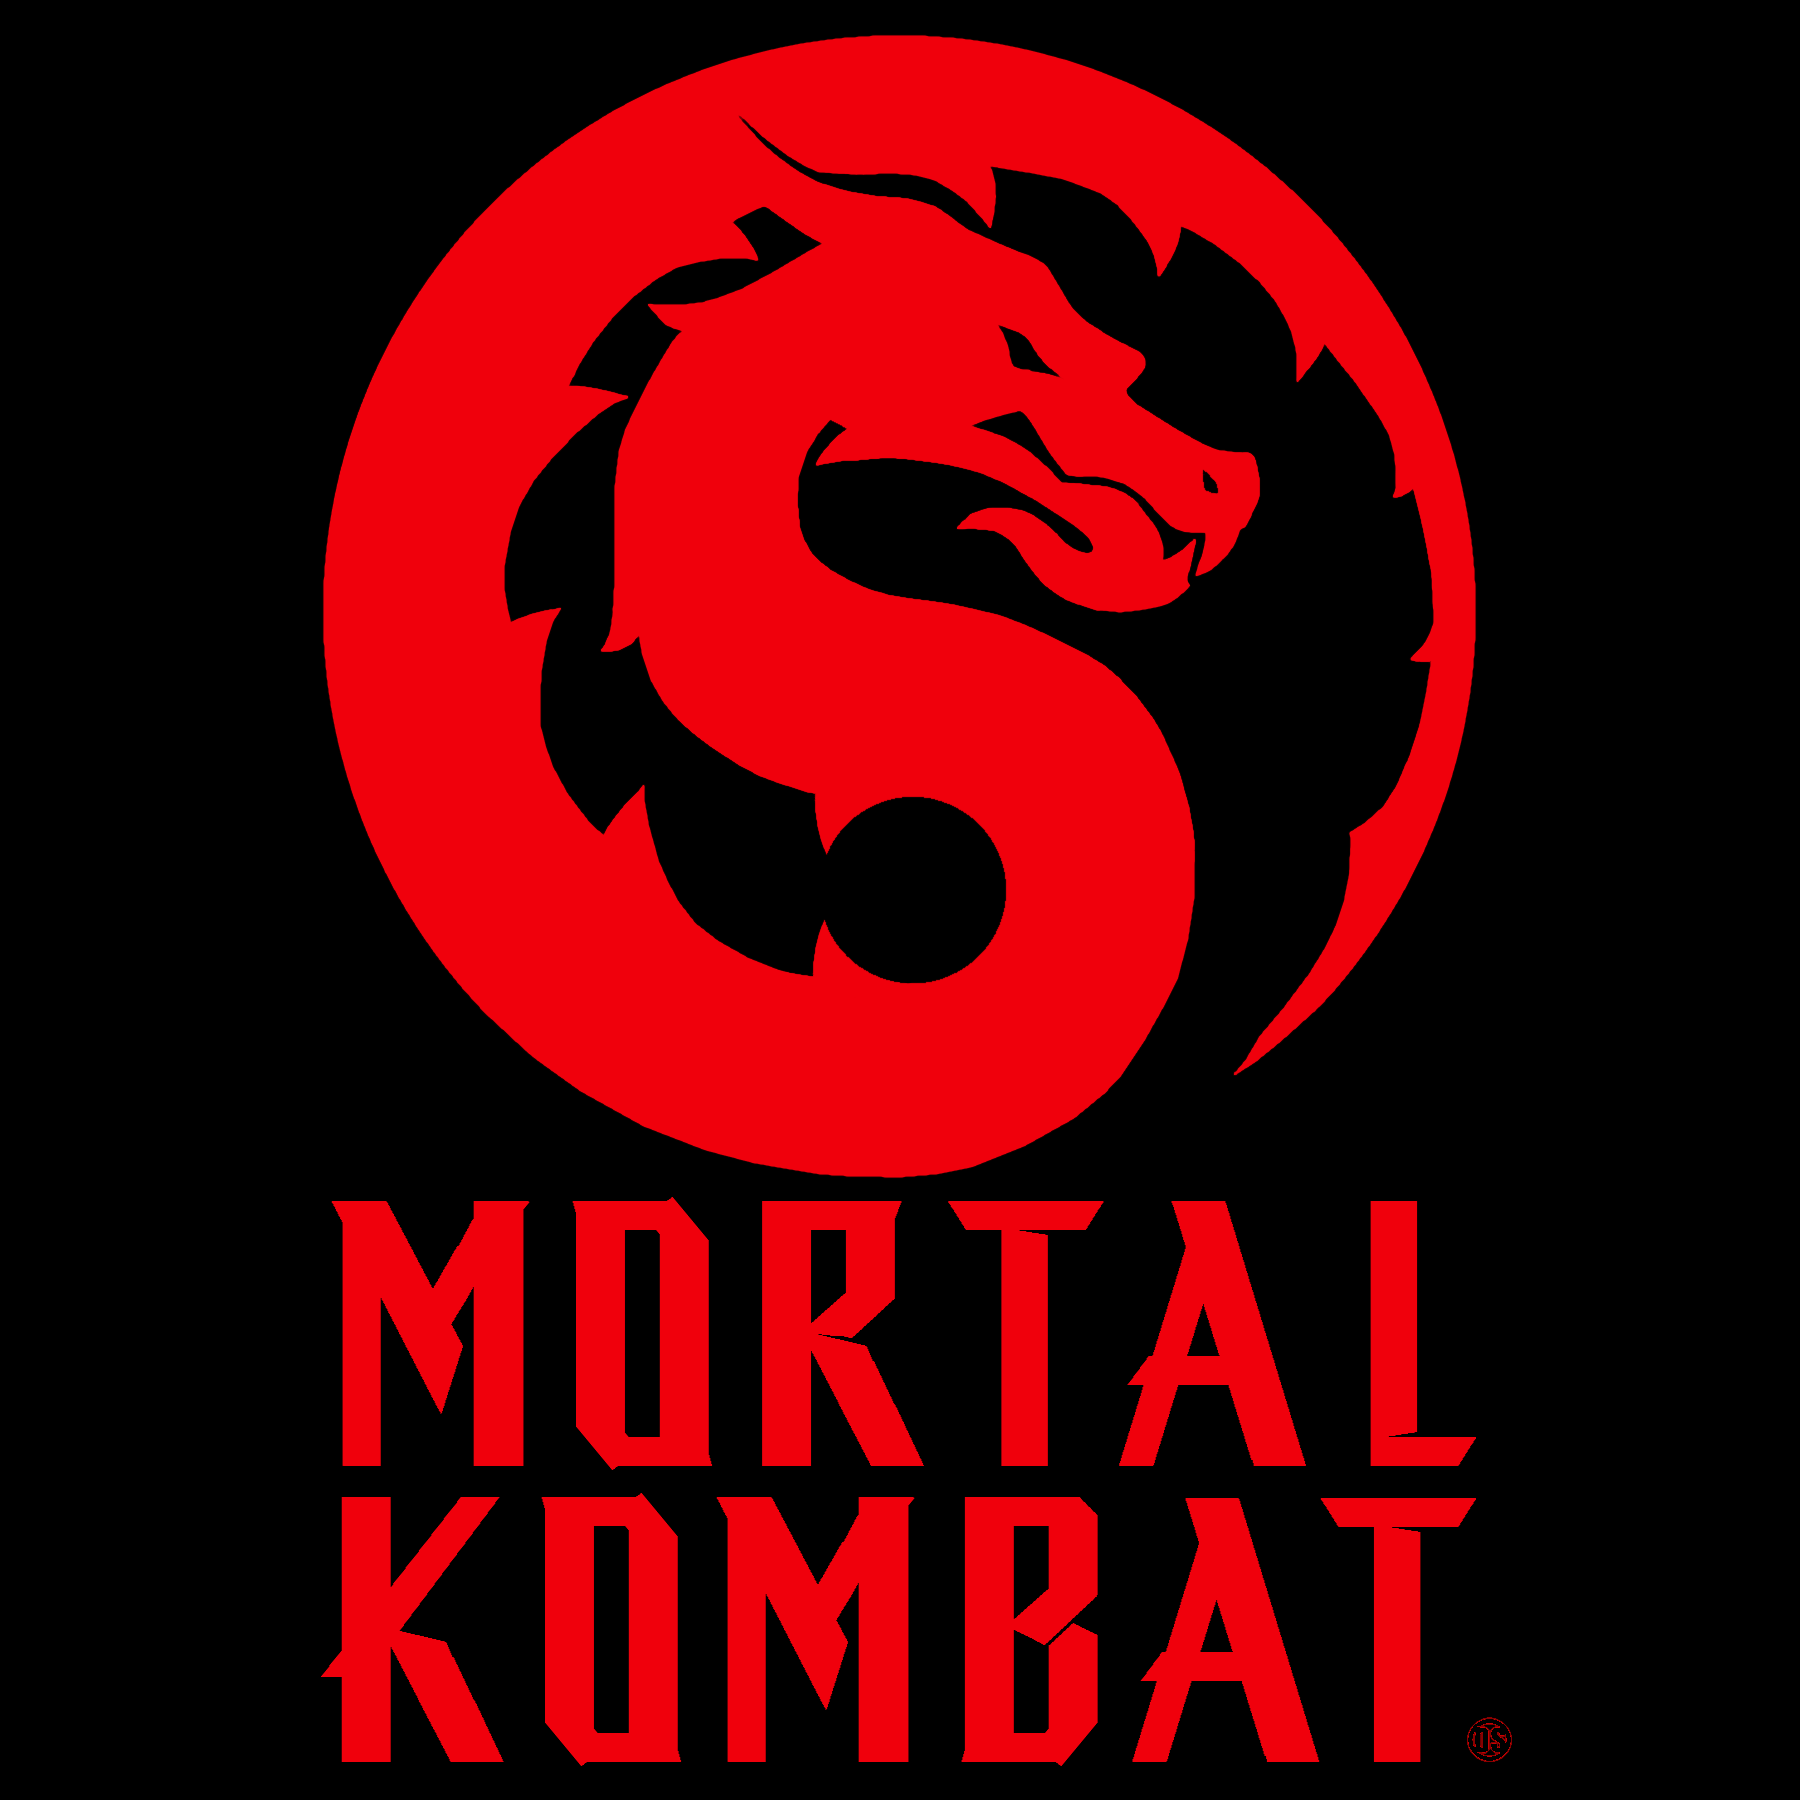 Mortal kombat Release